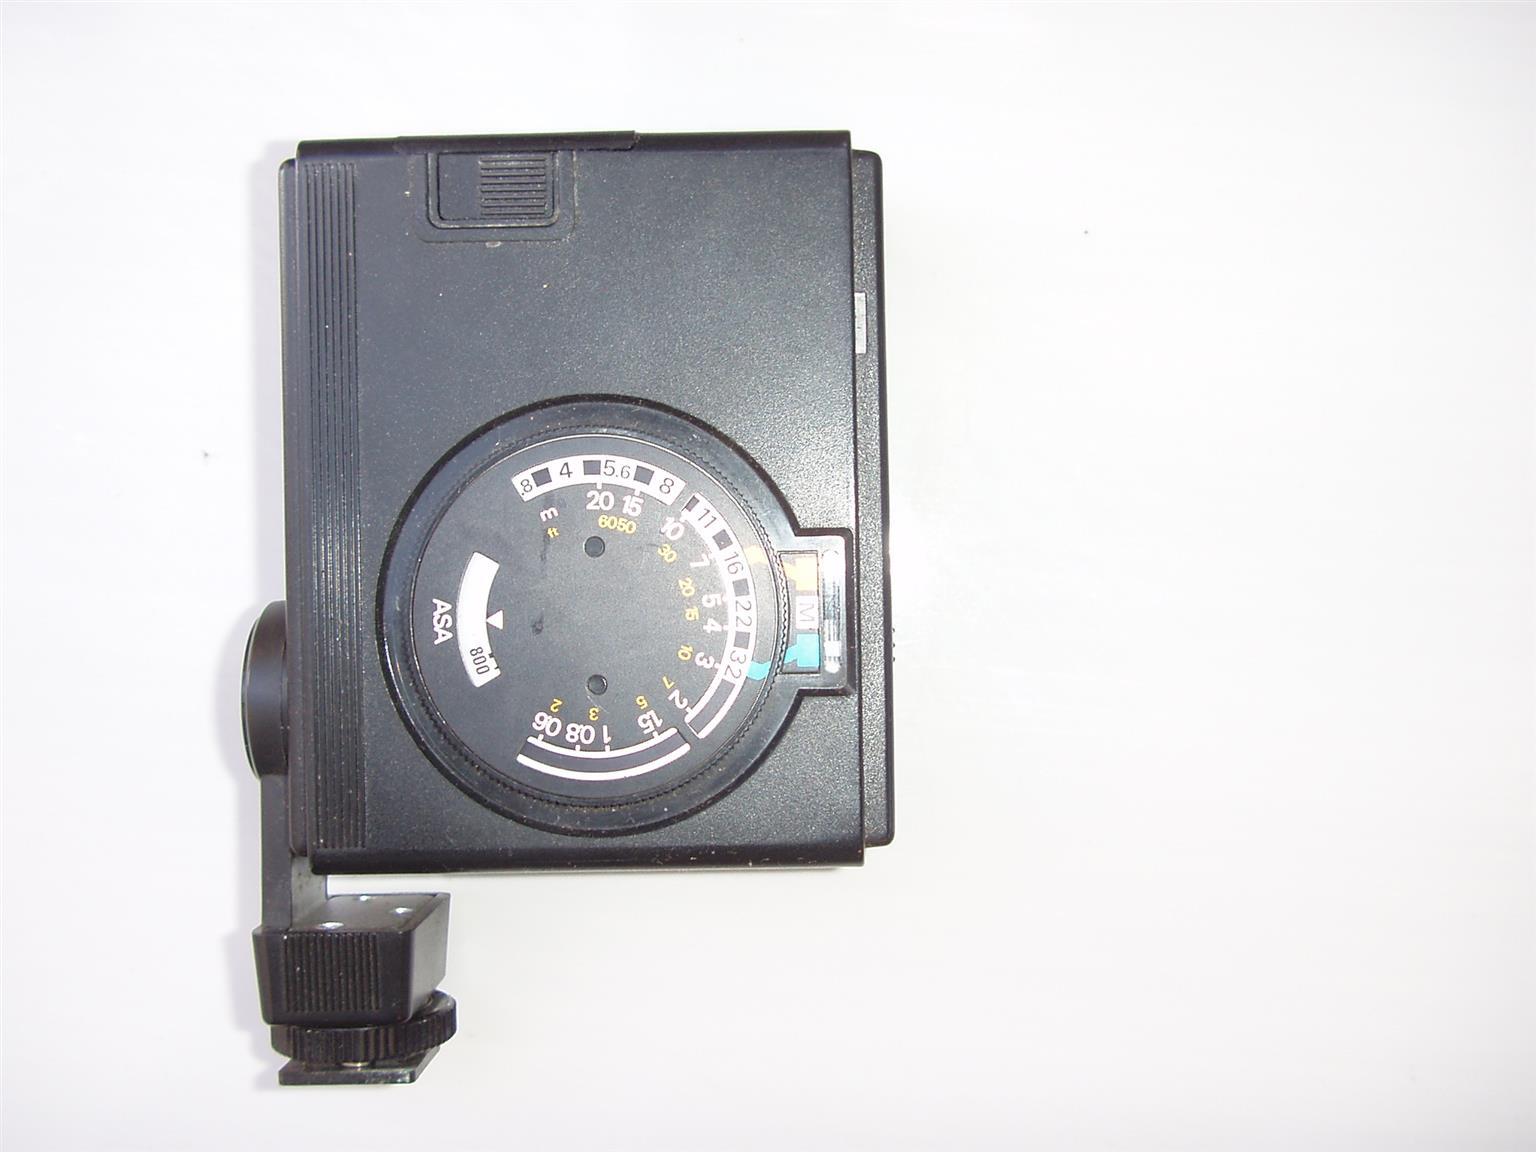 Nikon Speedlight SB-10 Shoe Mount Flash for Nikon